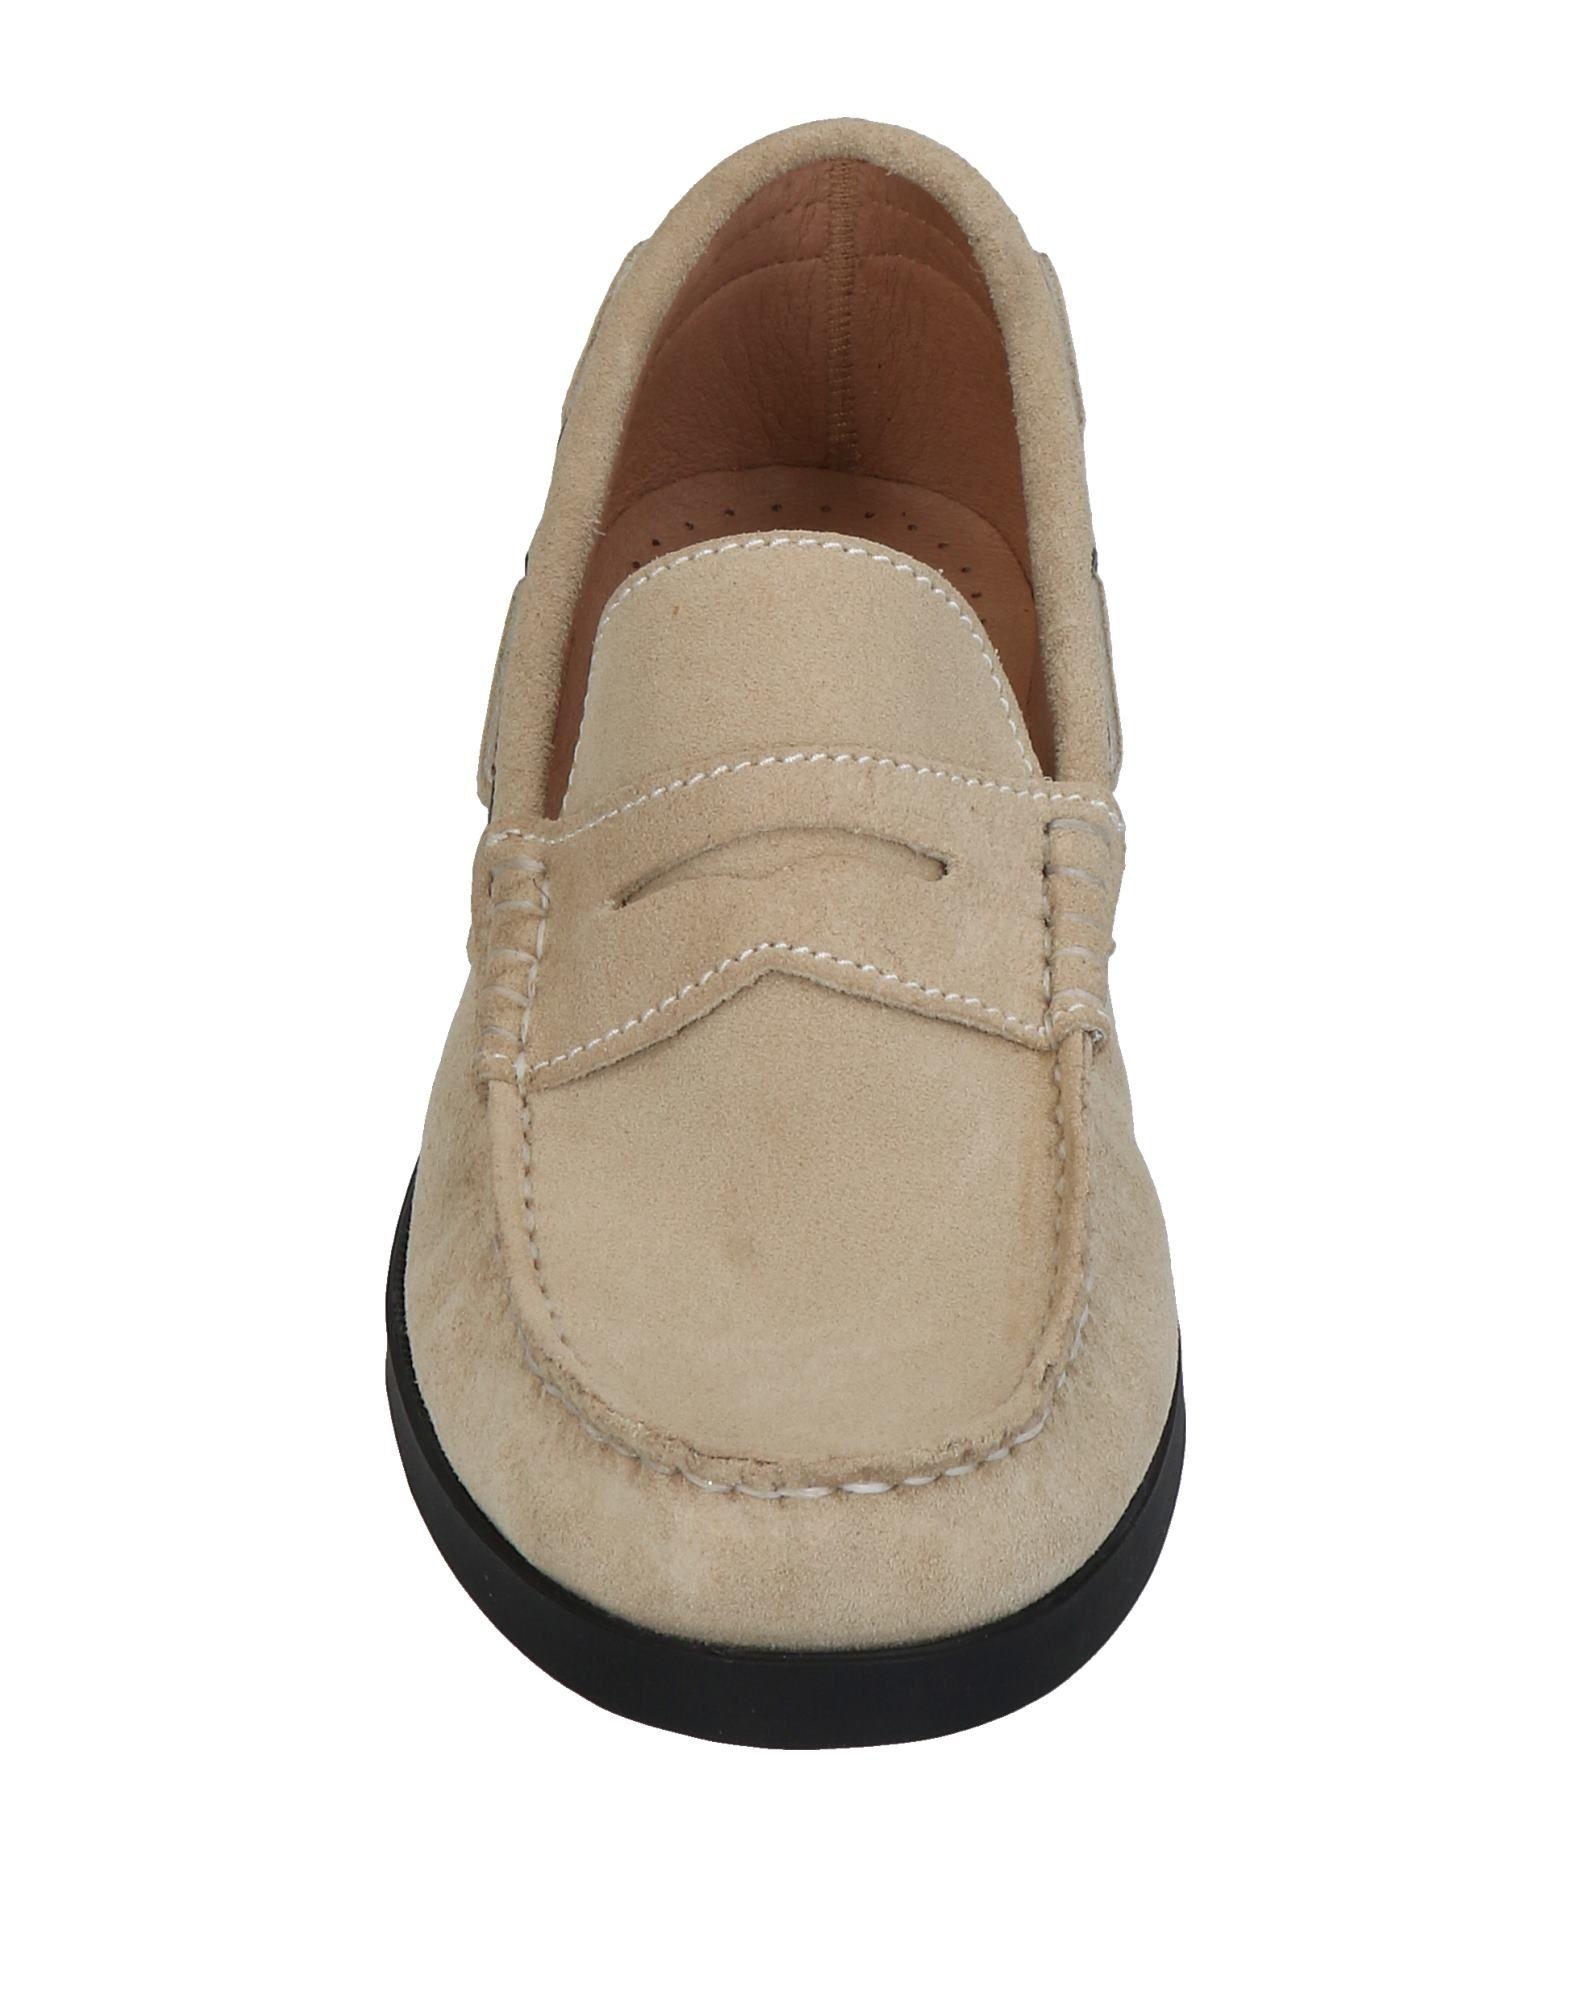 Profession: Bottier Mokassins Mokassins Mokassins Herren  11437682BM Neue Schuhe d3752f